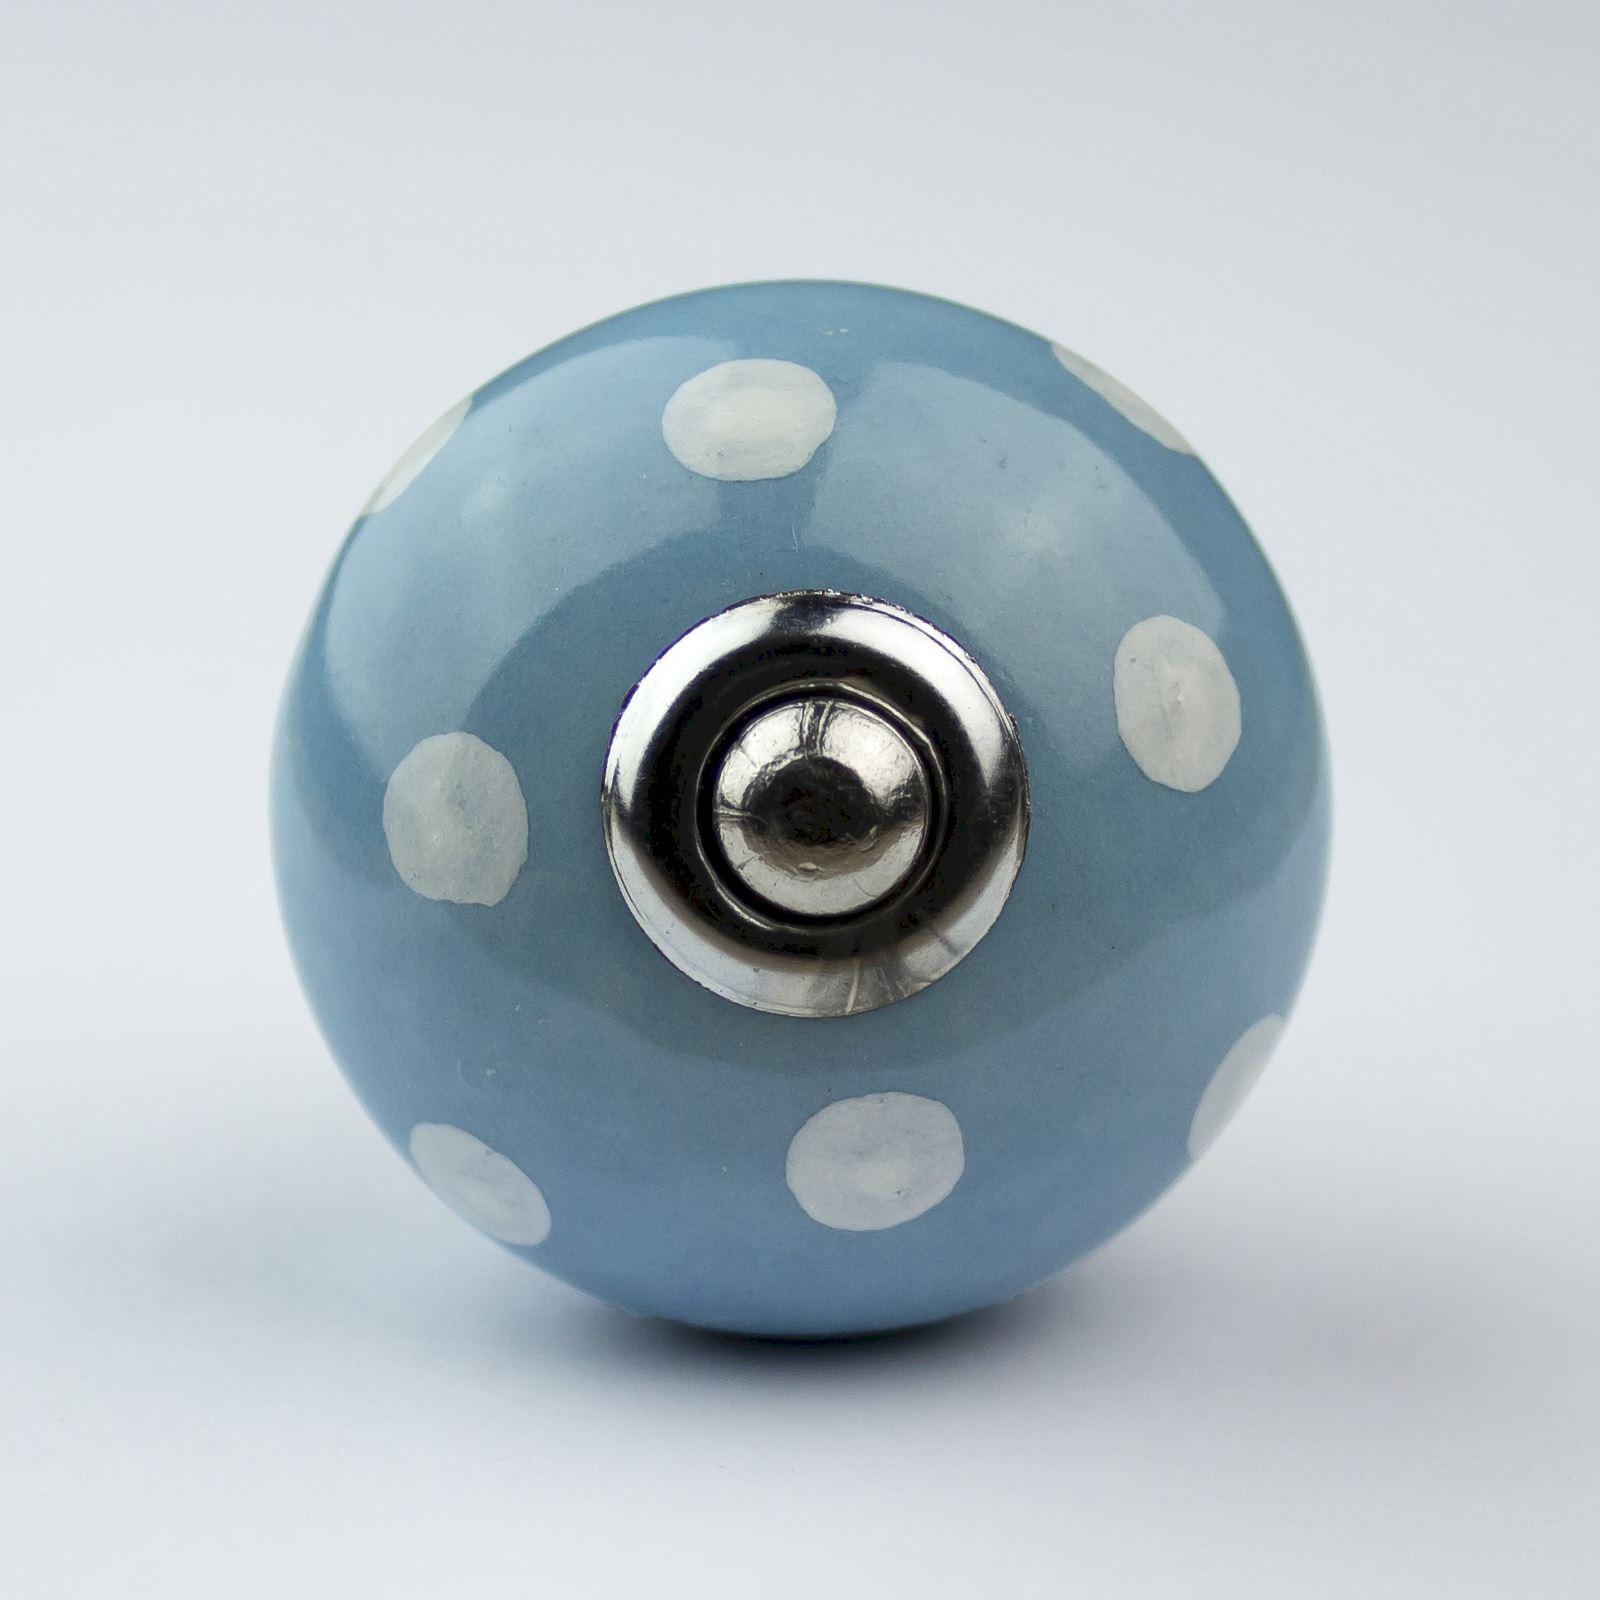 Blue White Navy Ceramic Door Knobs Handles Furniture Drawer Pulls ...